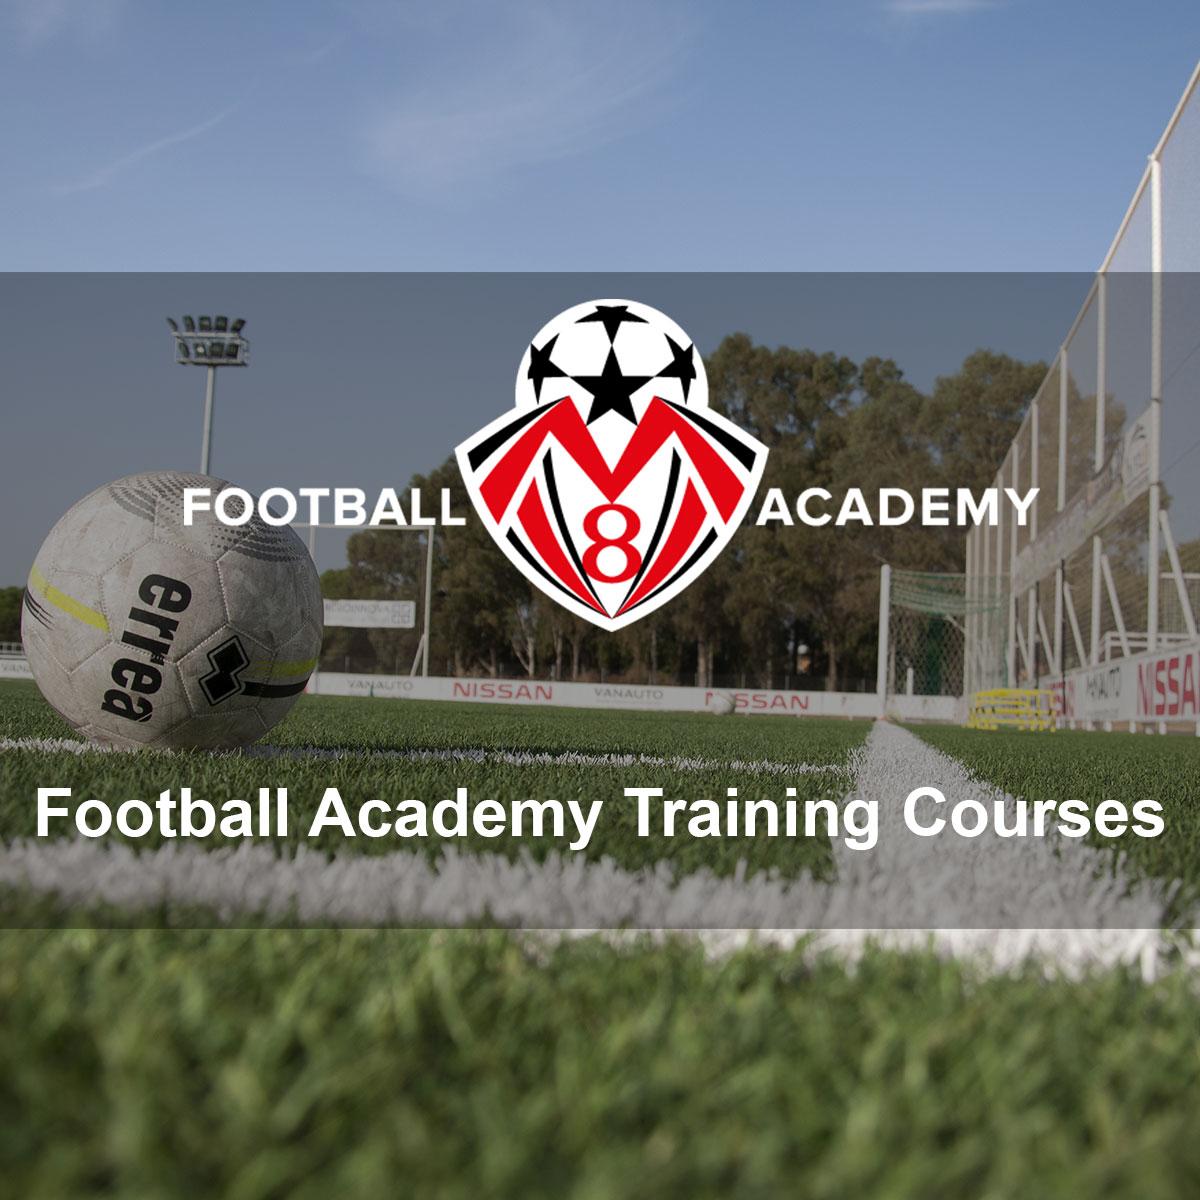 MV8 Academy